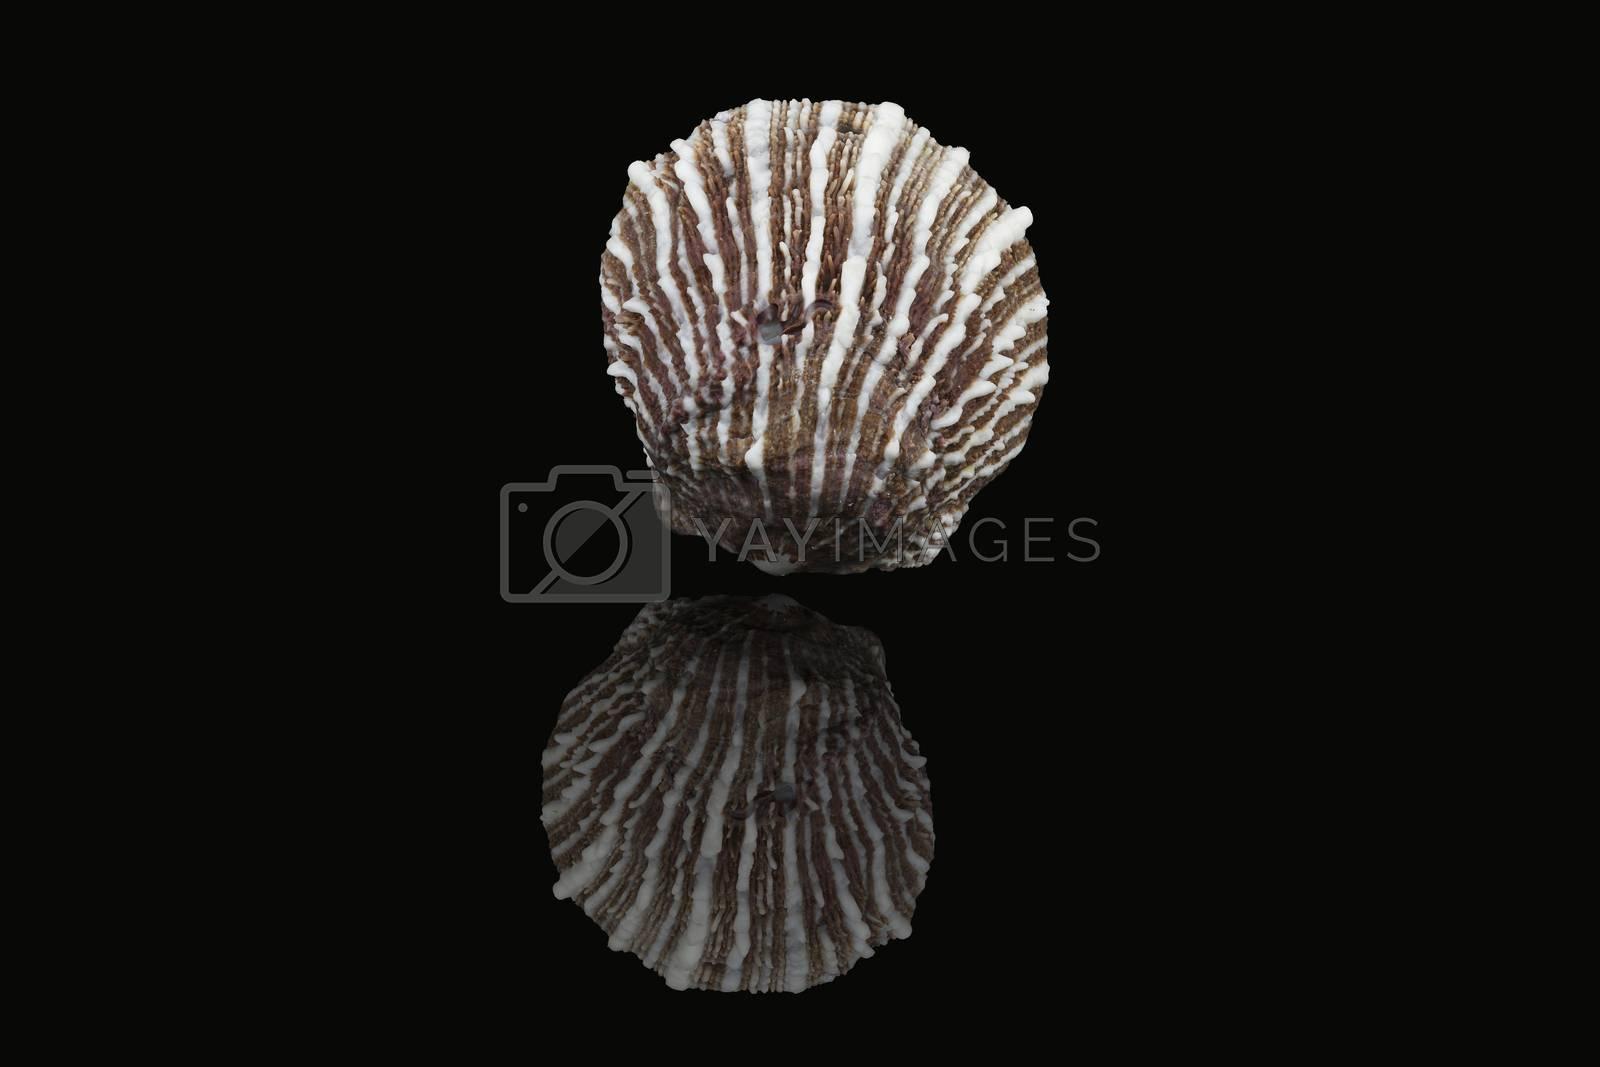 Royalty free image of Seashell, Dubai, United Arab Emirates by GABIS